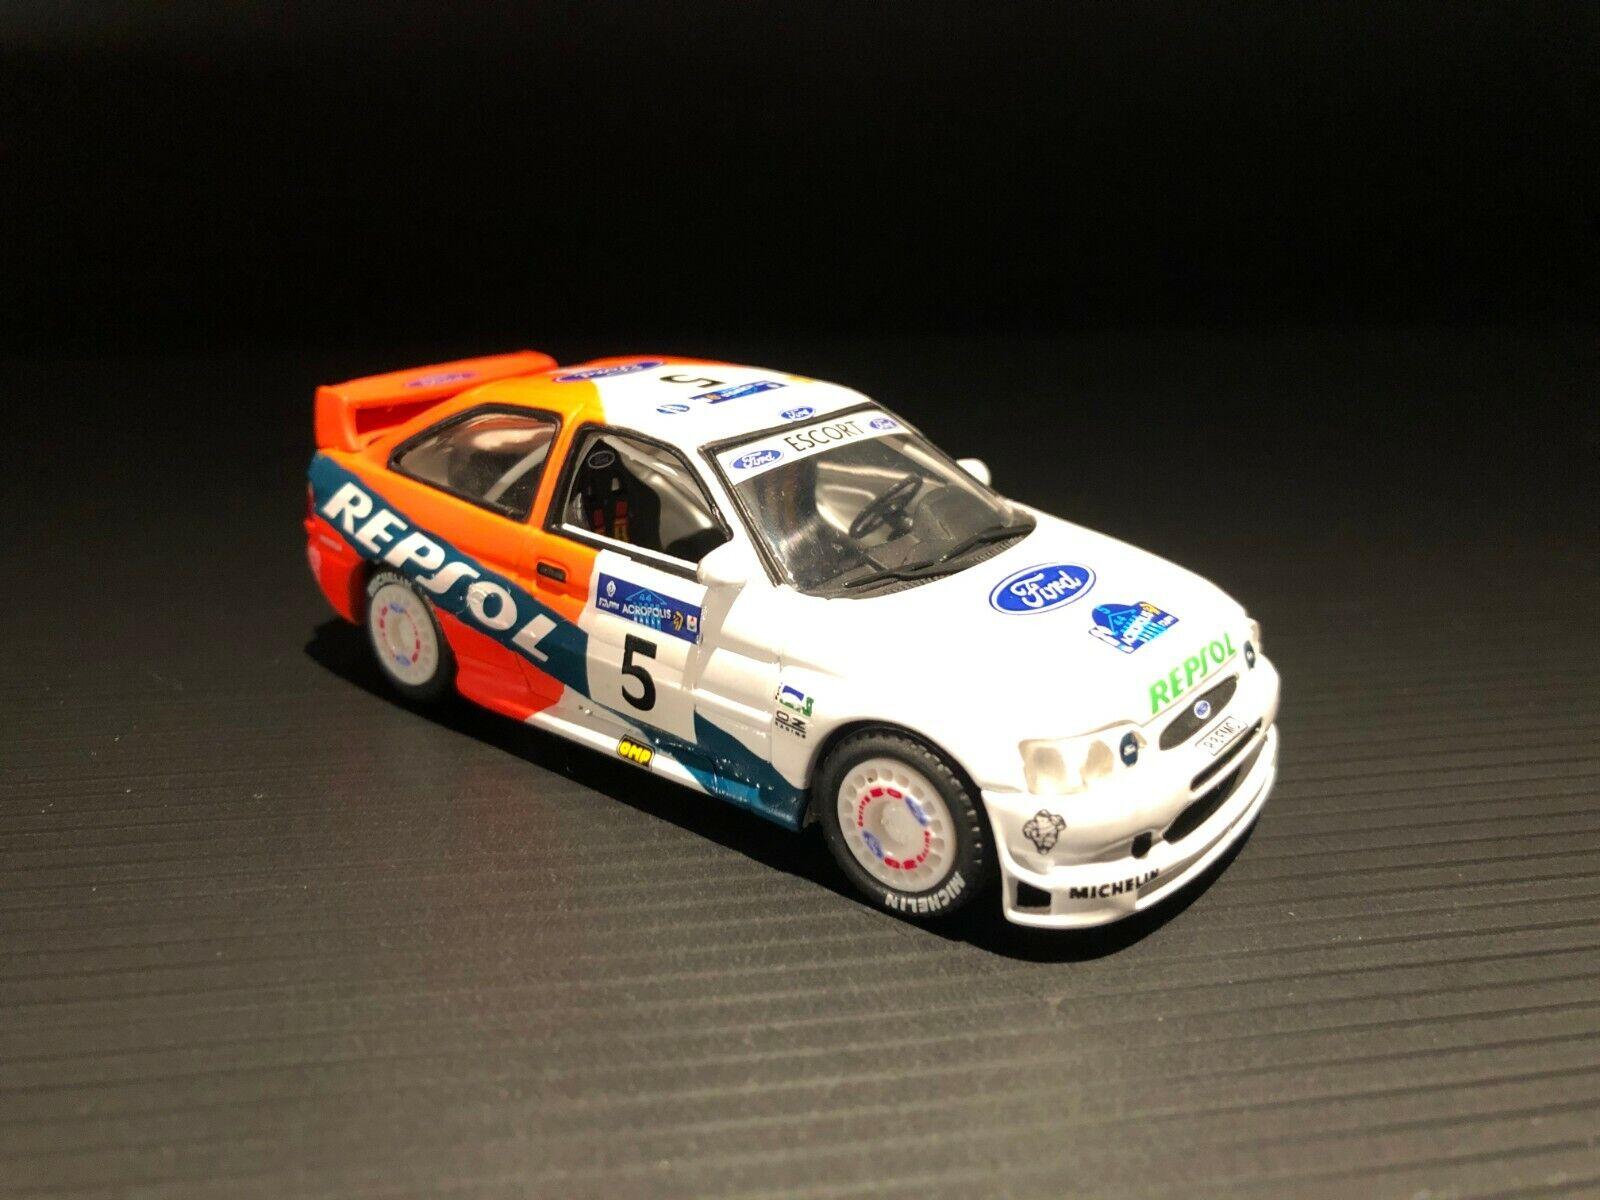 1 43 Ford Escort WRC Acropolis 1997 Sainz Moya Team Repsol exclusive Vitesse